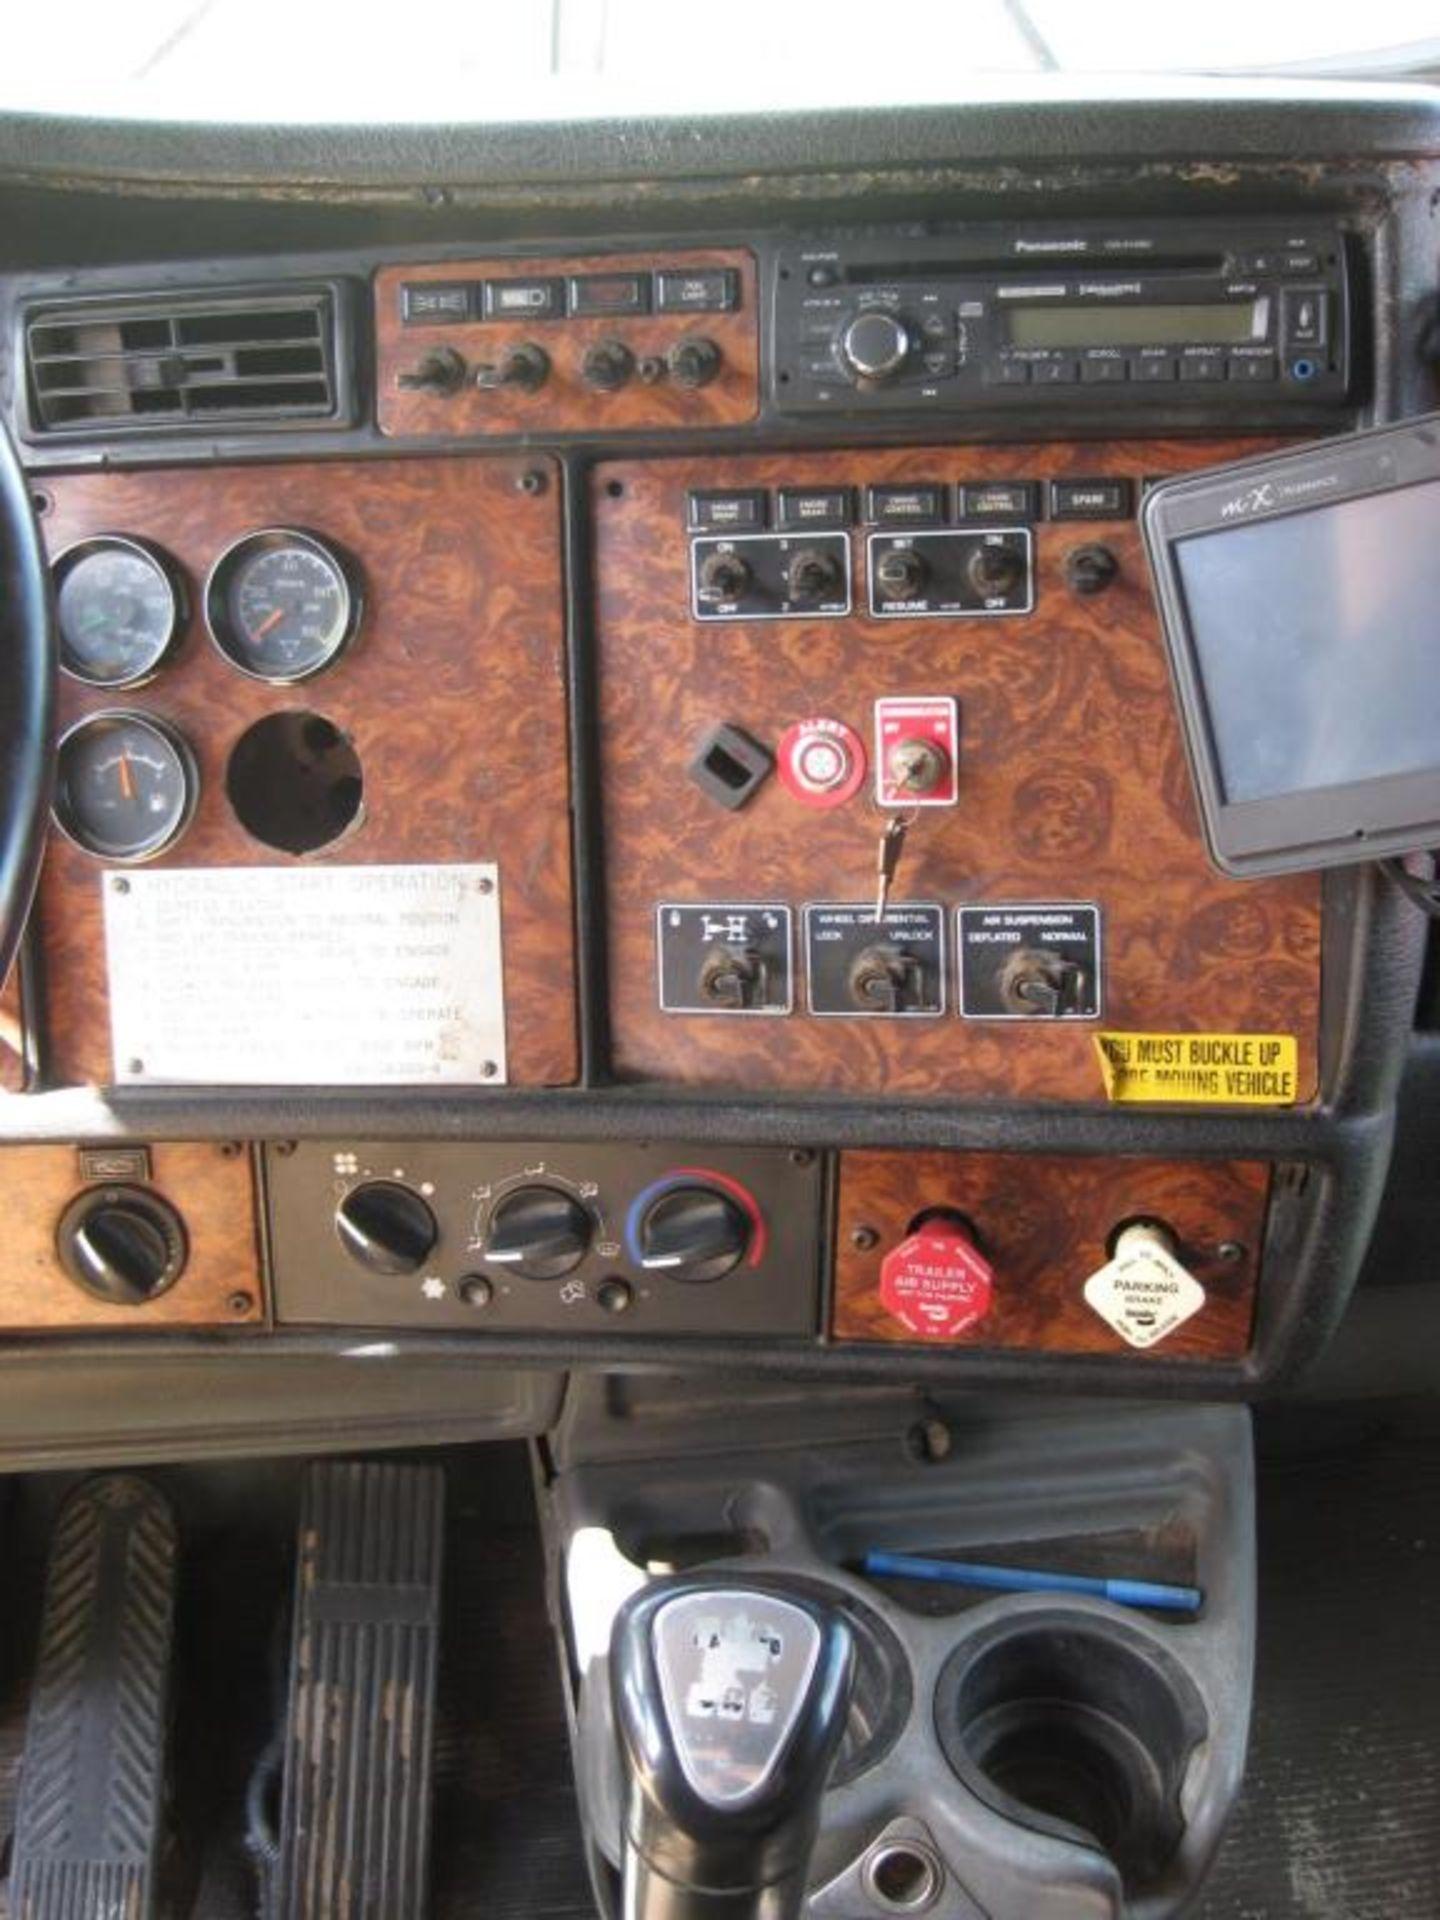 Kenworth Truck - Image 13 of 20